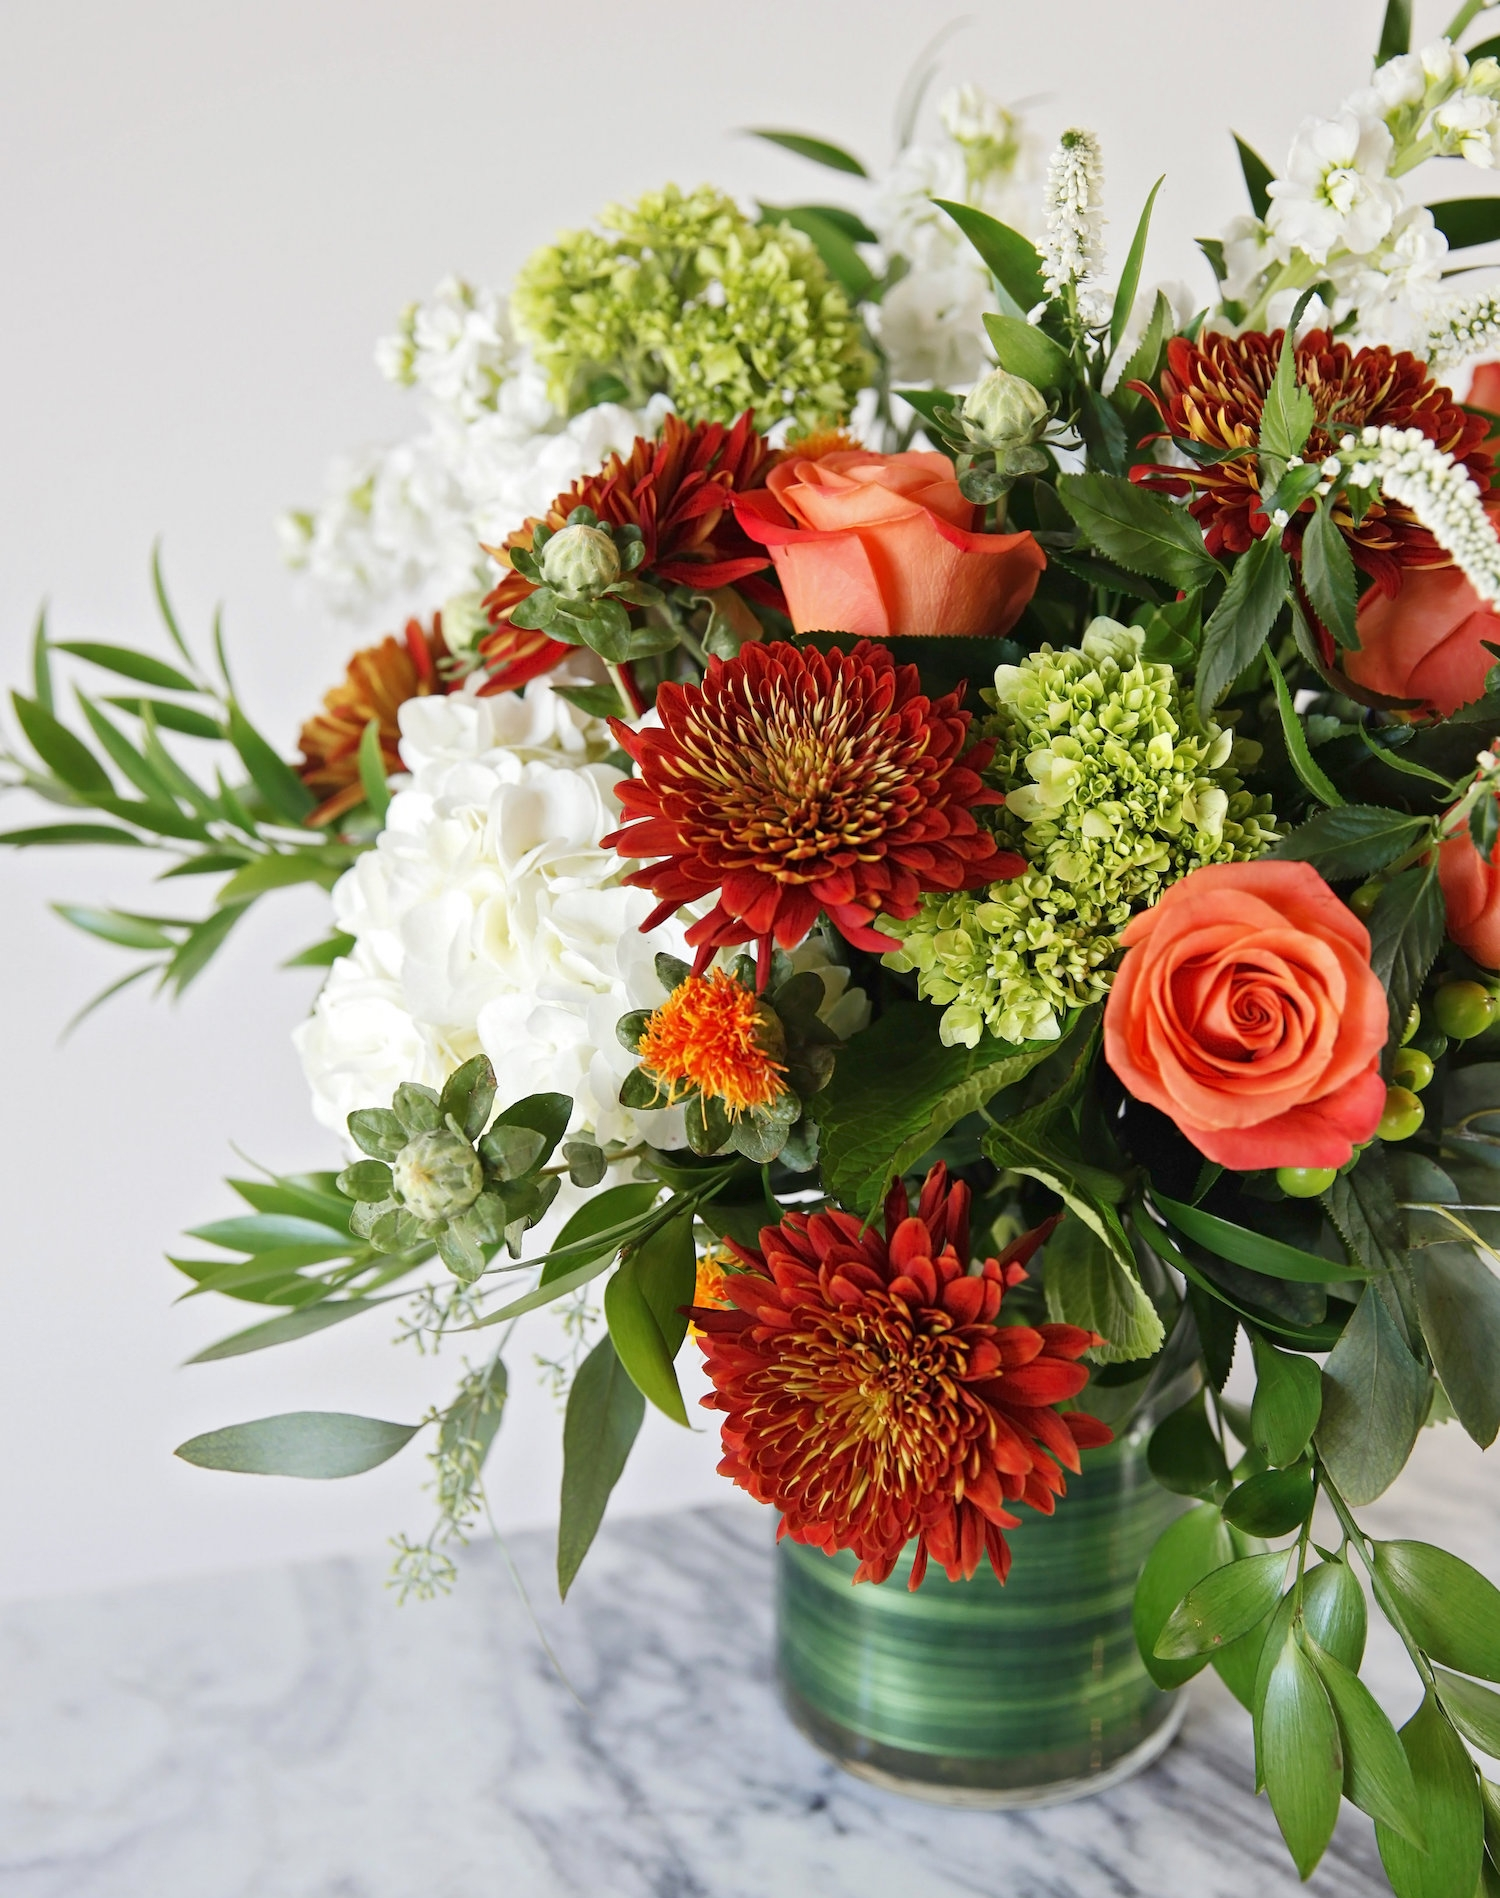 Jmorrisflowers-facebook-Sugar-maple-close-up.jpg